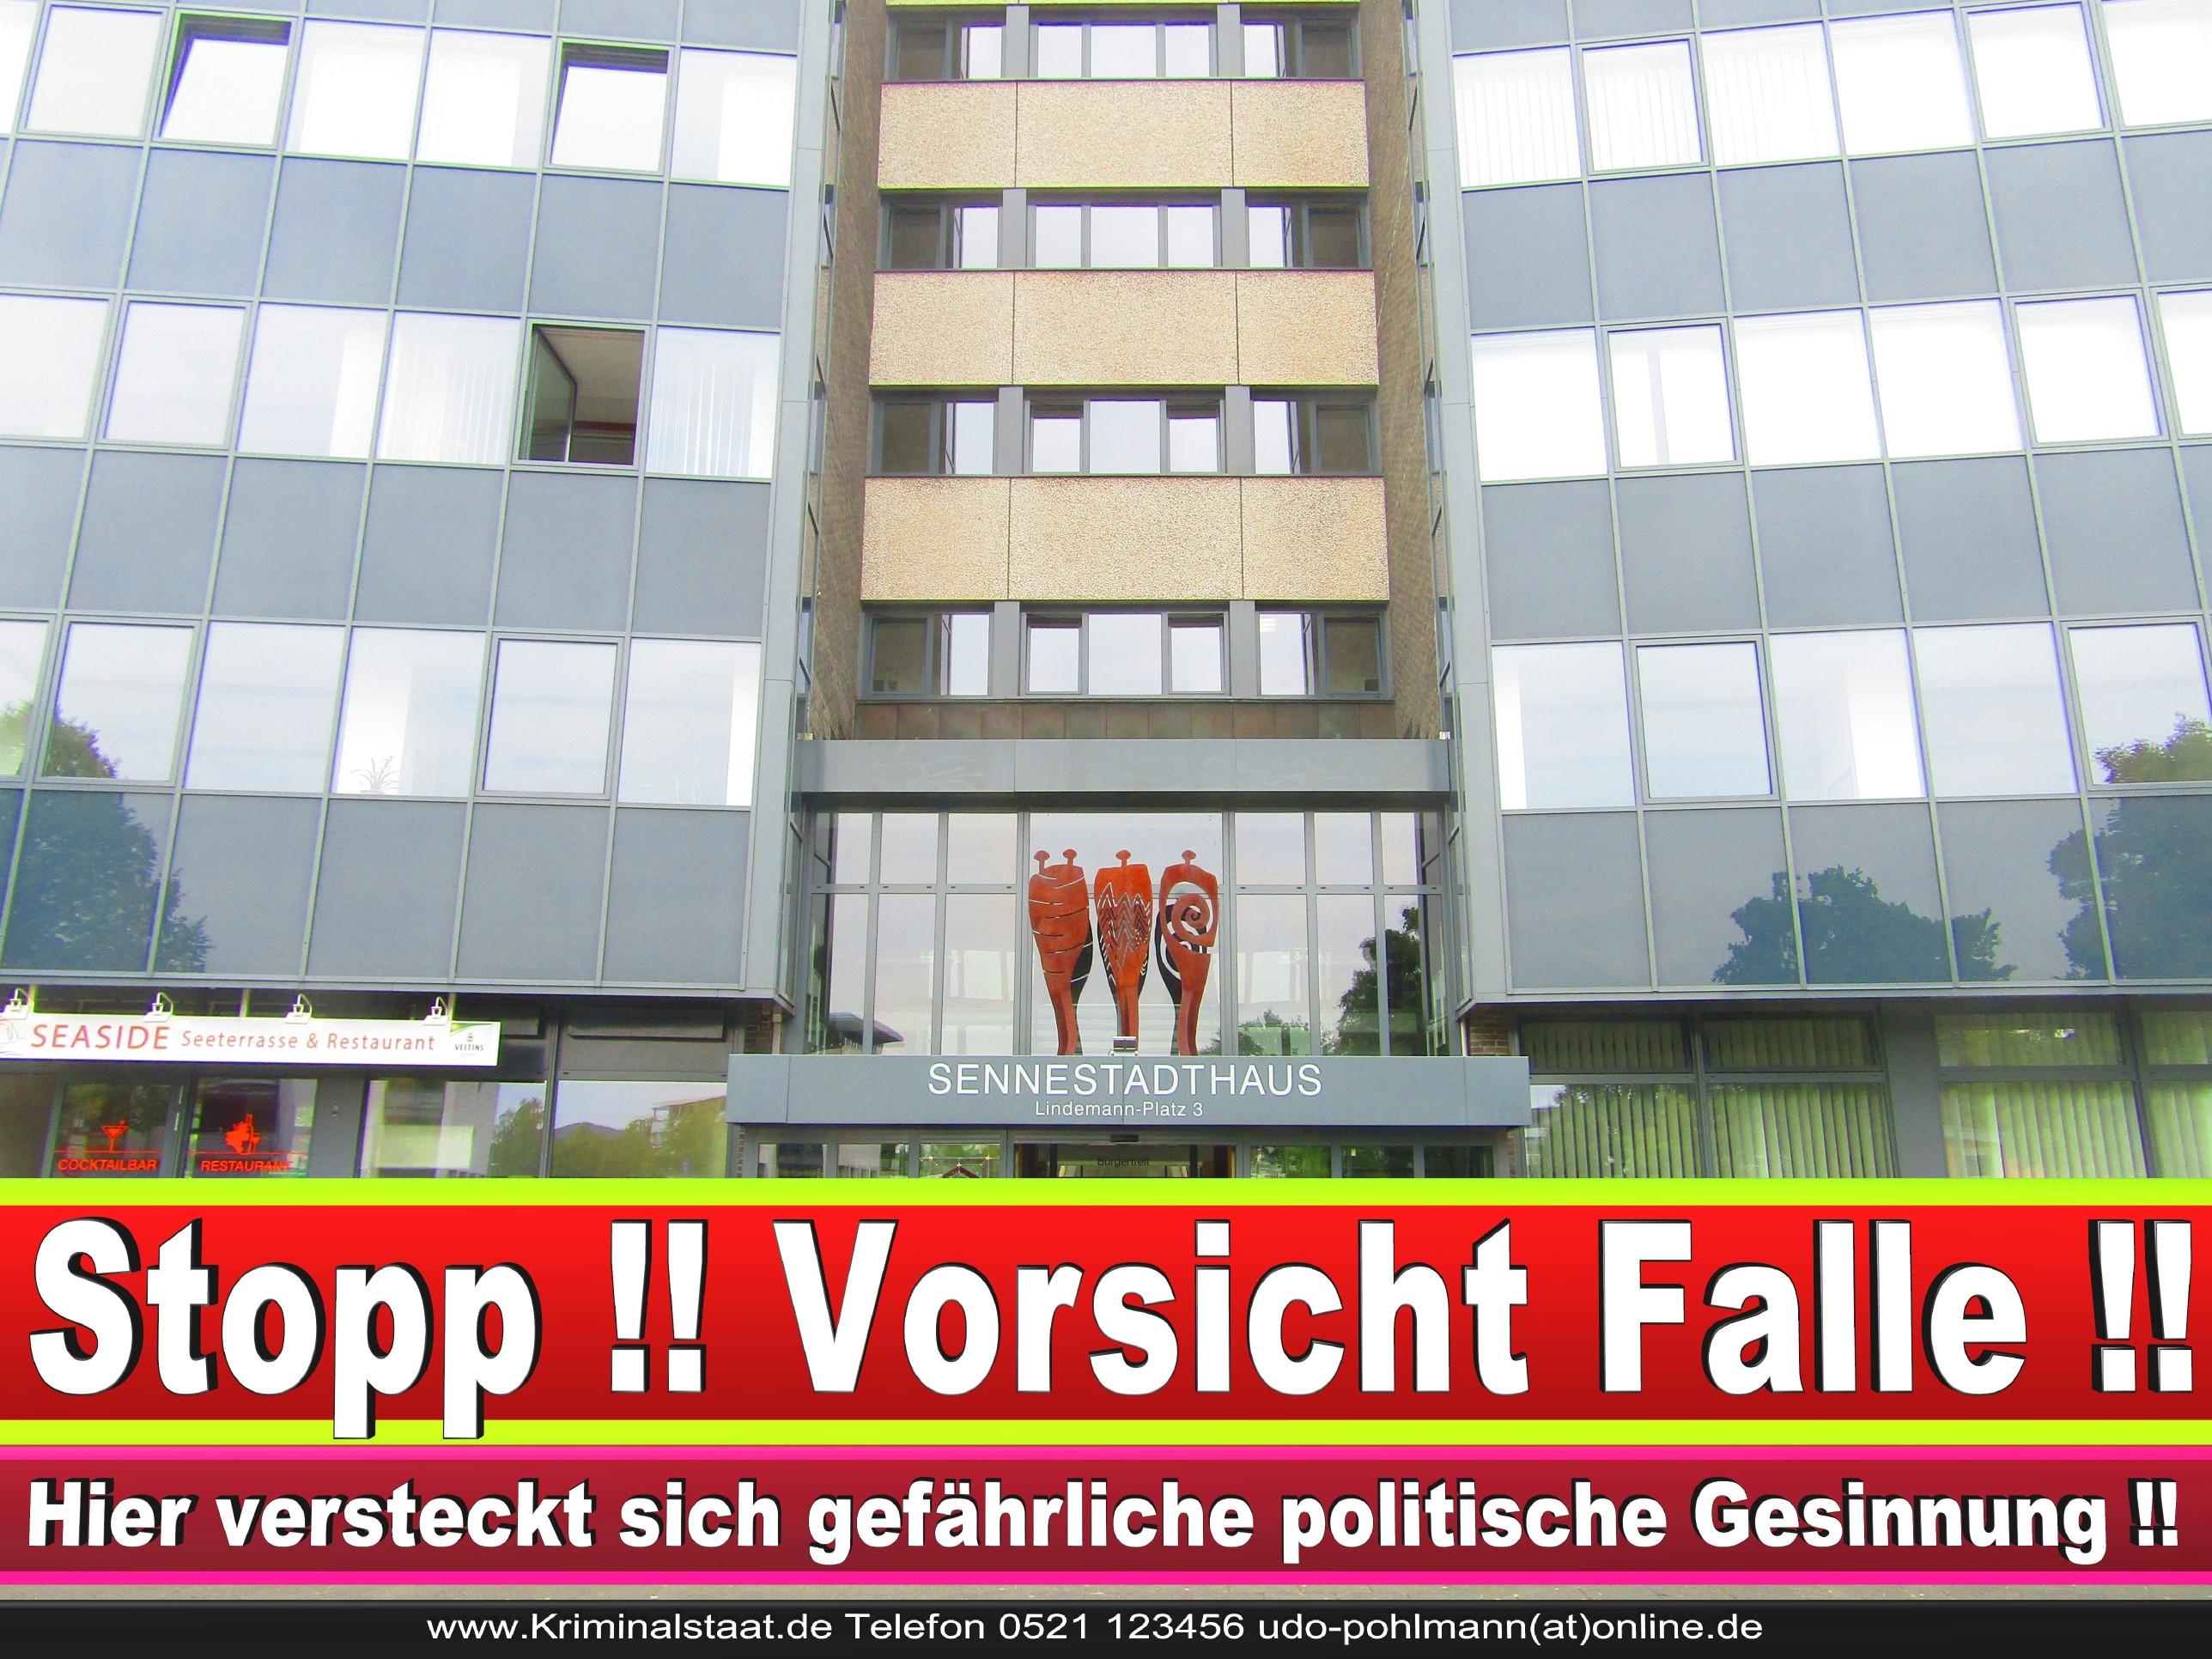 SENNESTADT VEREIN CDU Bielefeld 2 LANDTAGSWAHL BUNDESTAGSWAHL BÜRGERMEISTERWAHL